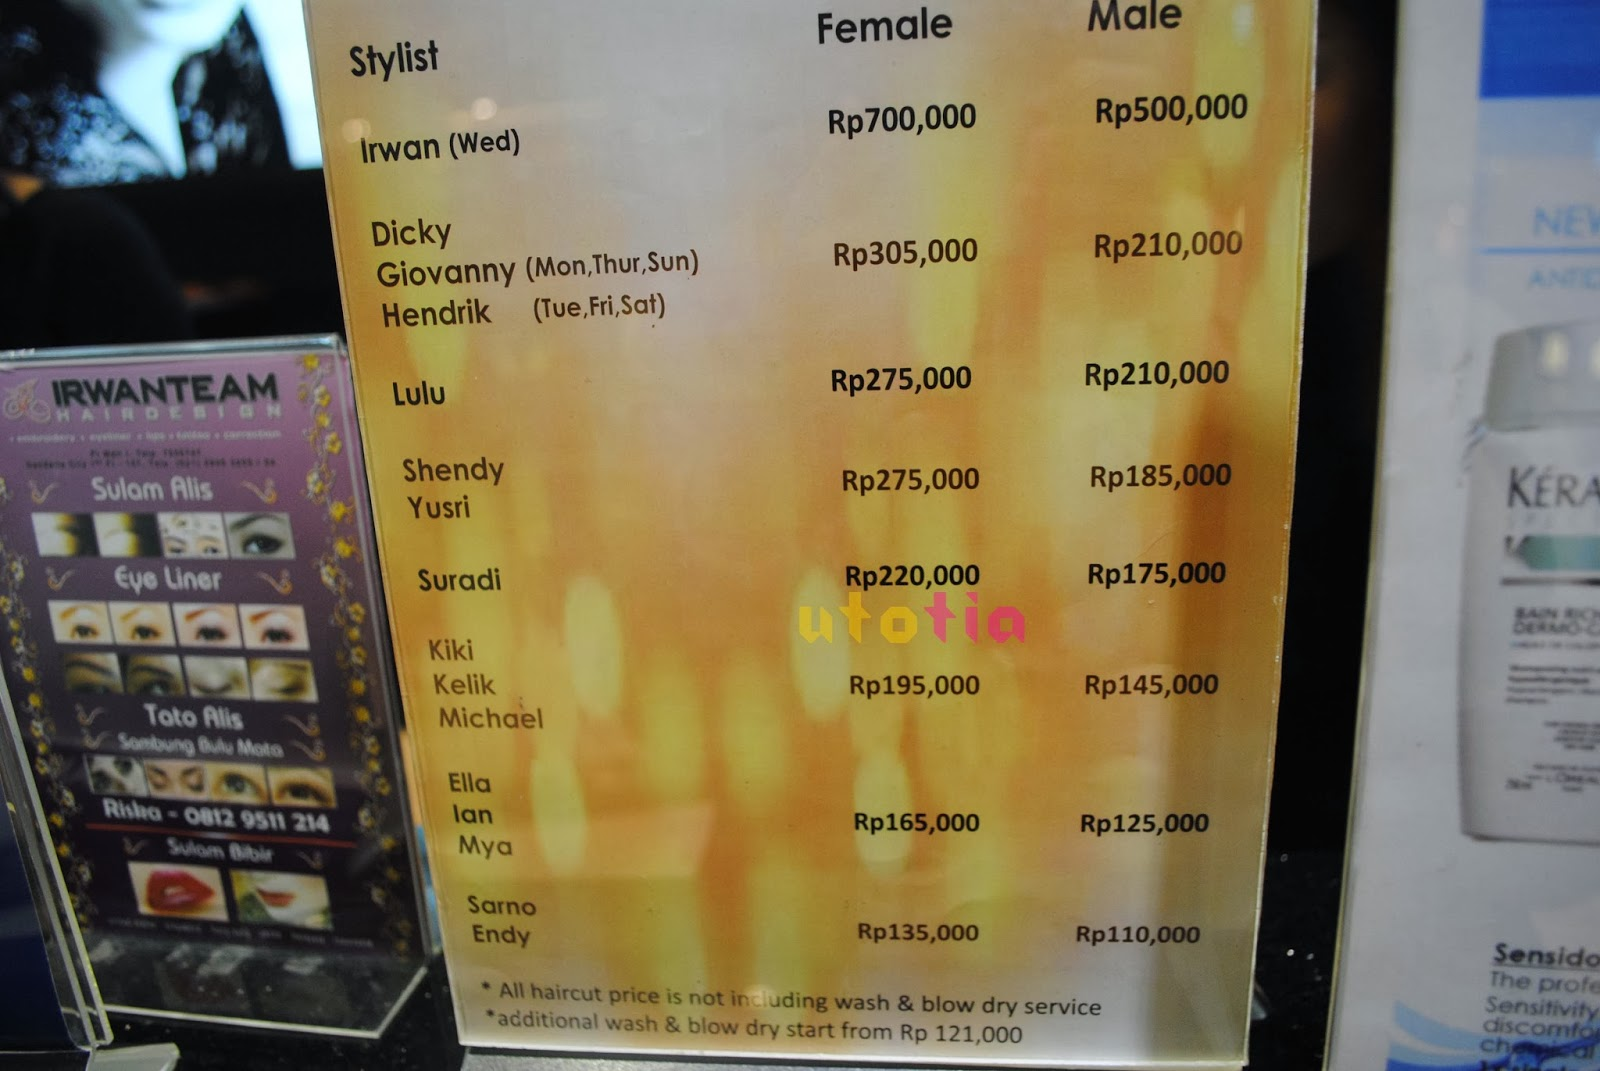 Hair Style Prices: IRWAN TEAM HAIR DESIGN Coloring Service